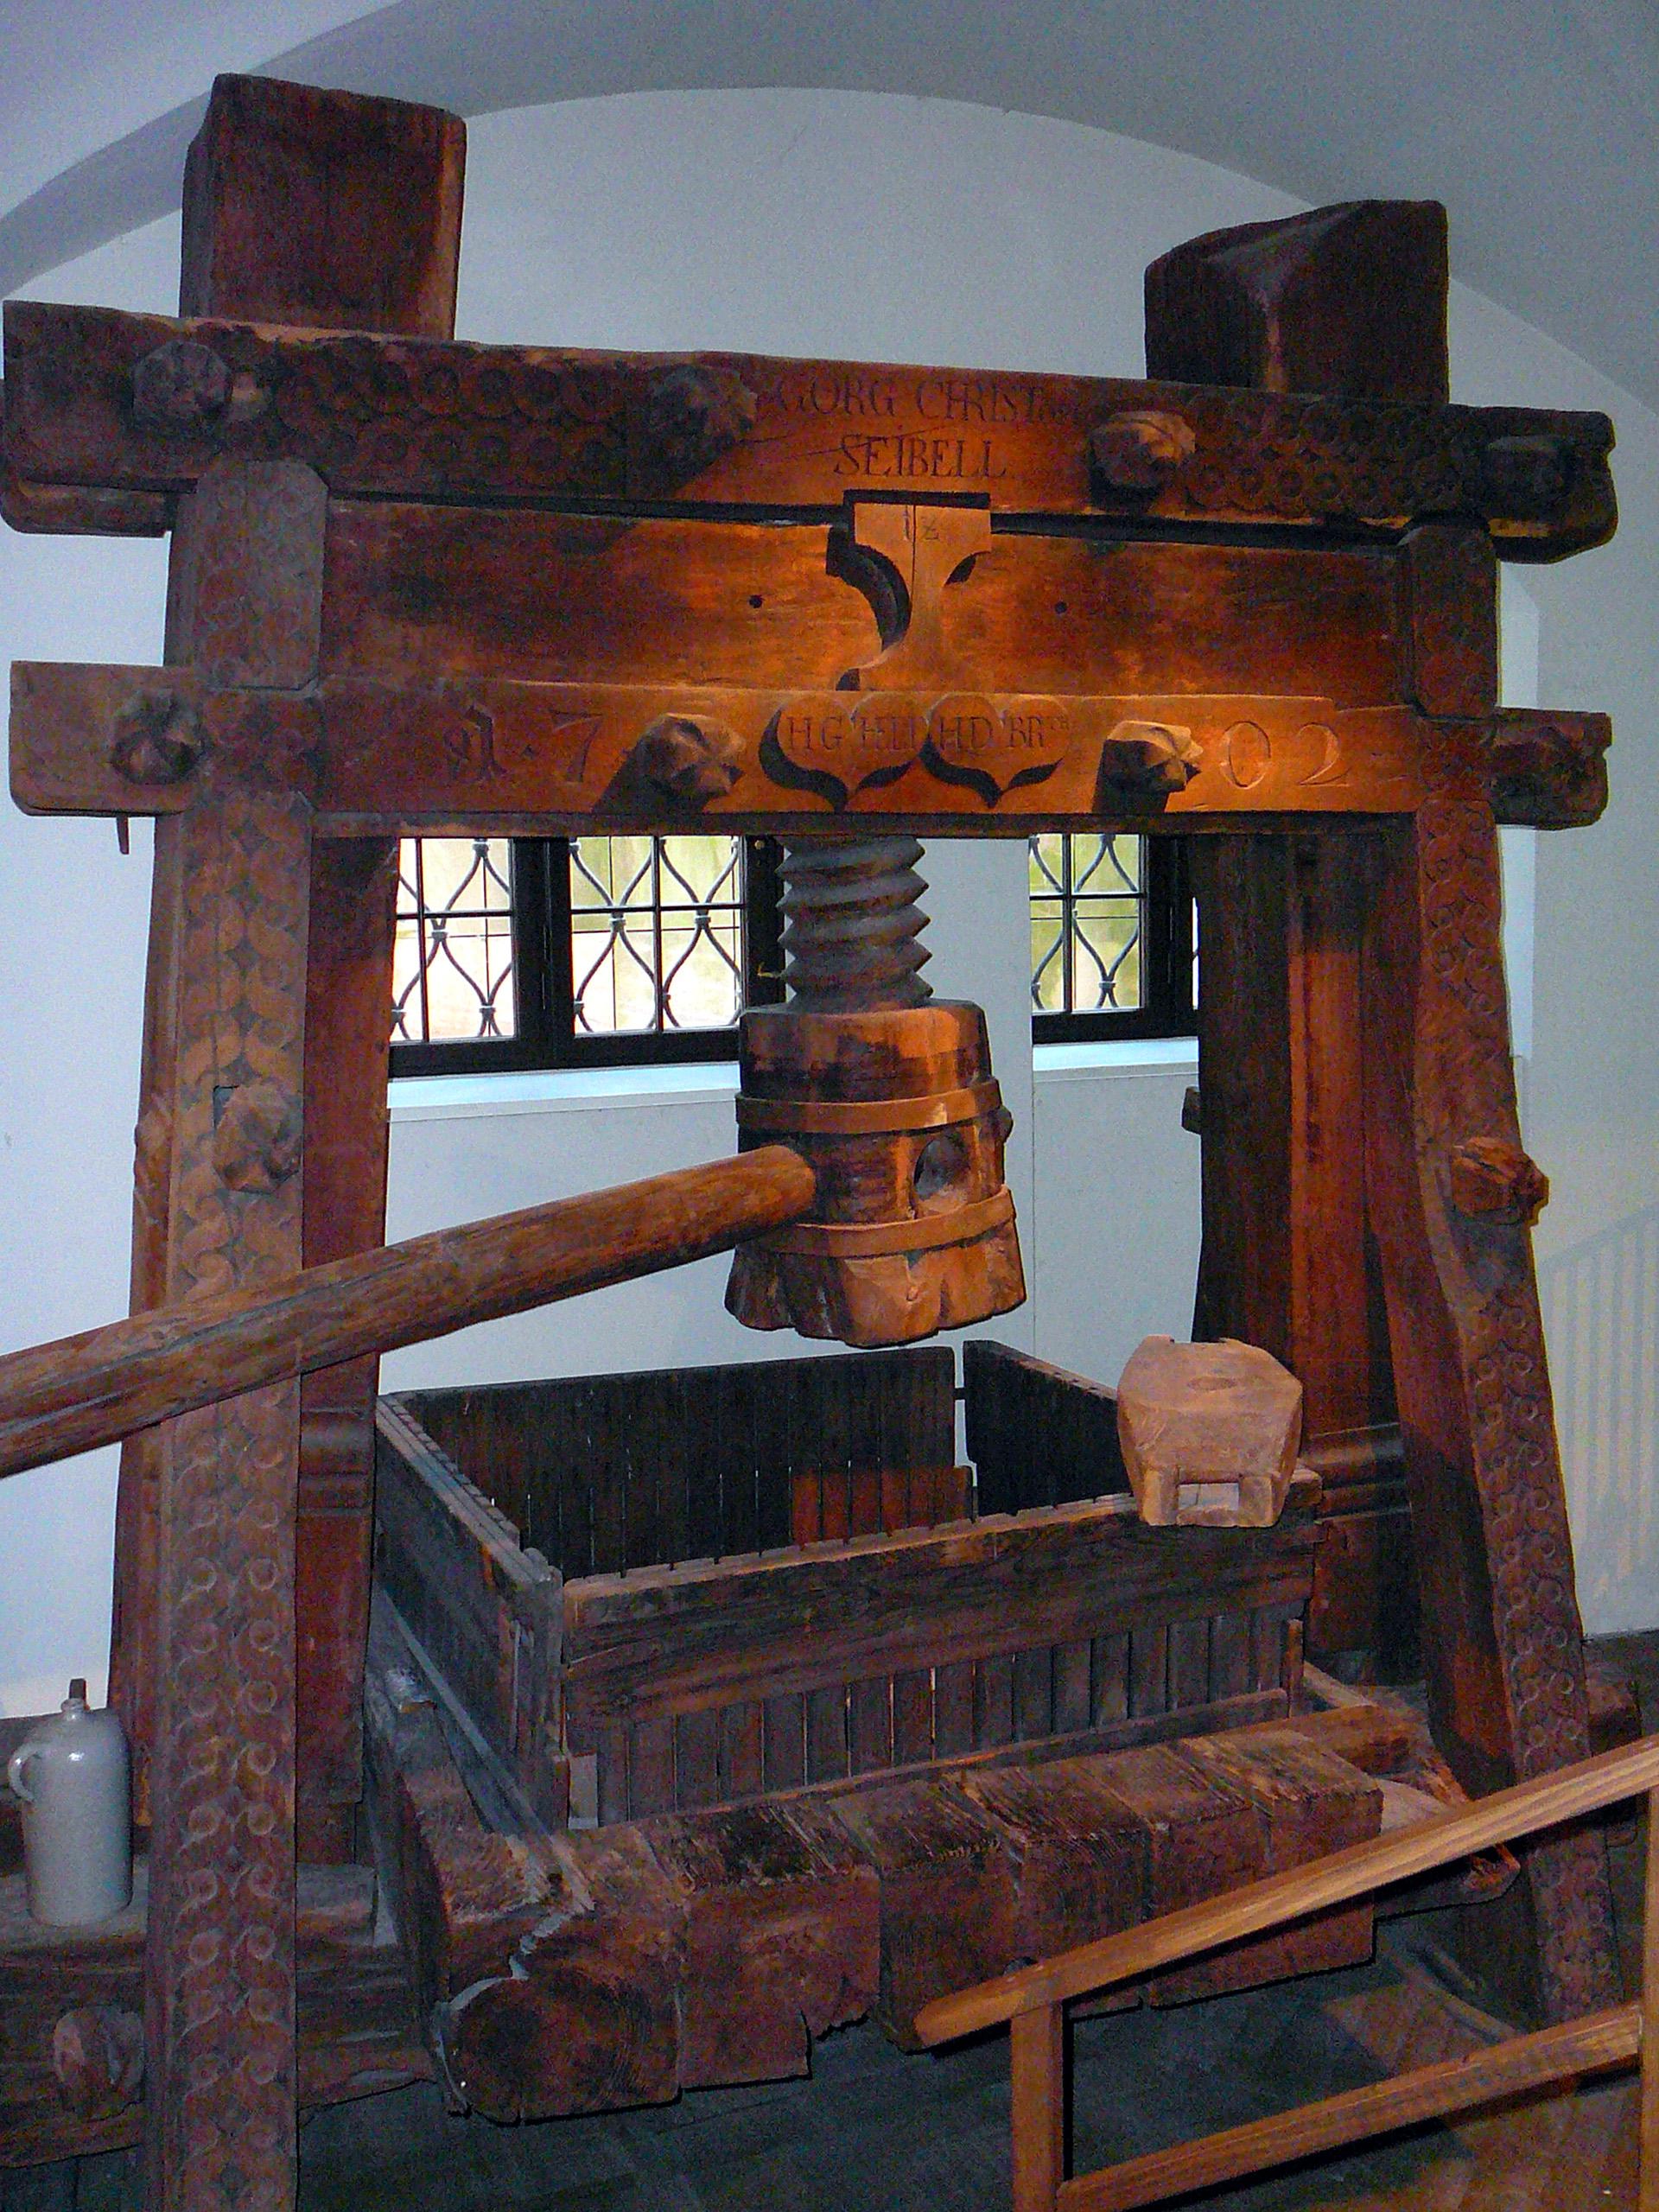 The printing press by johannes gutenberg essay